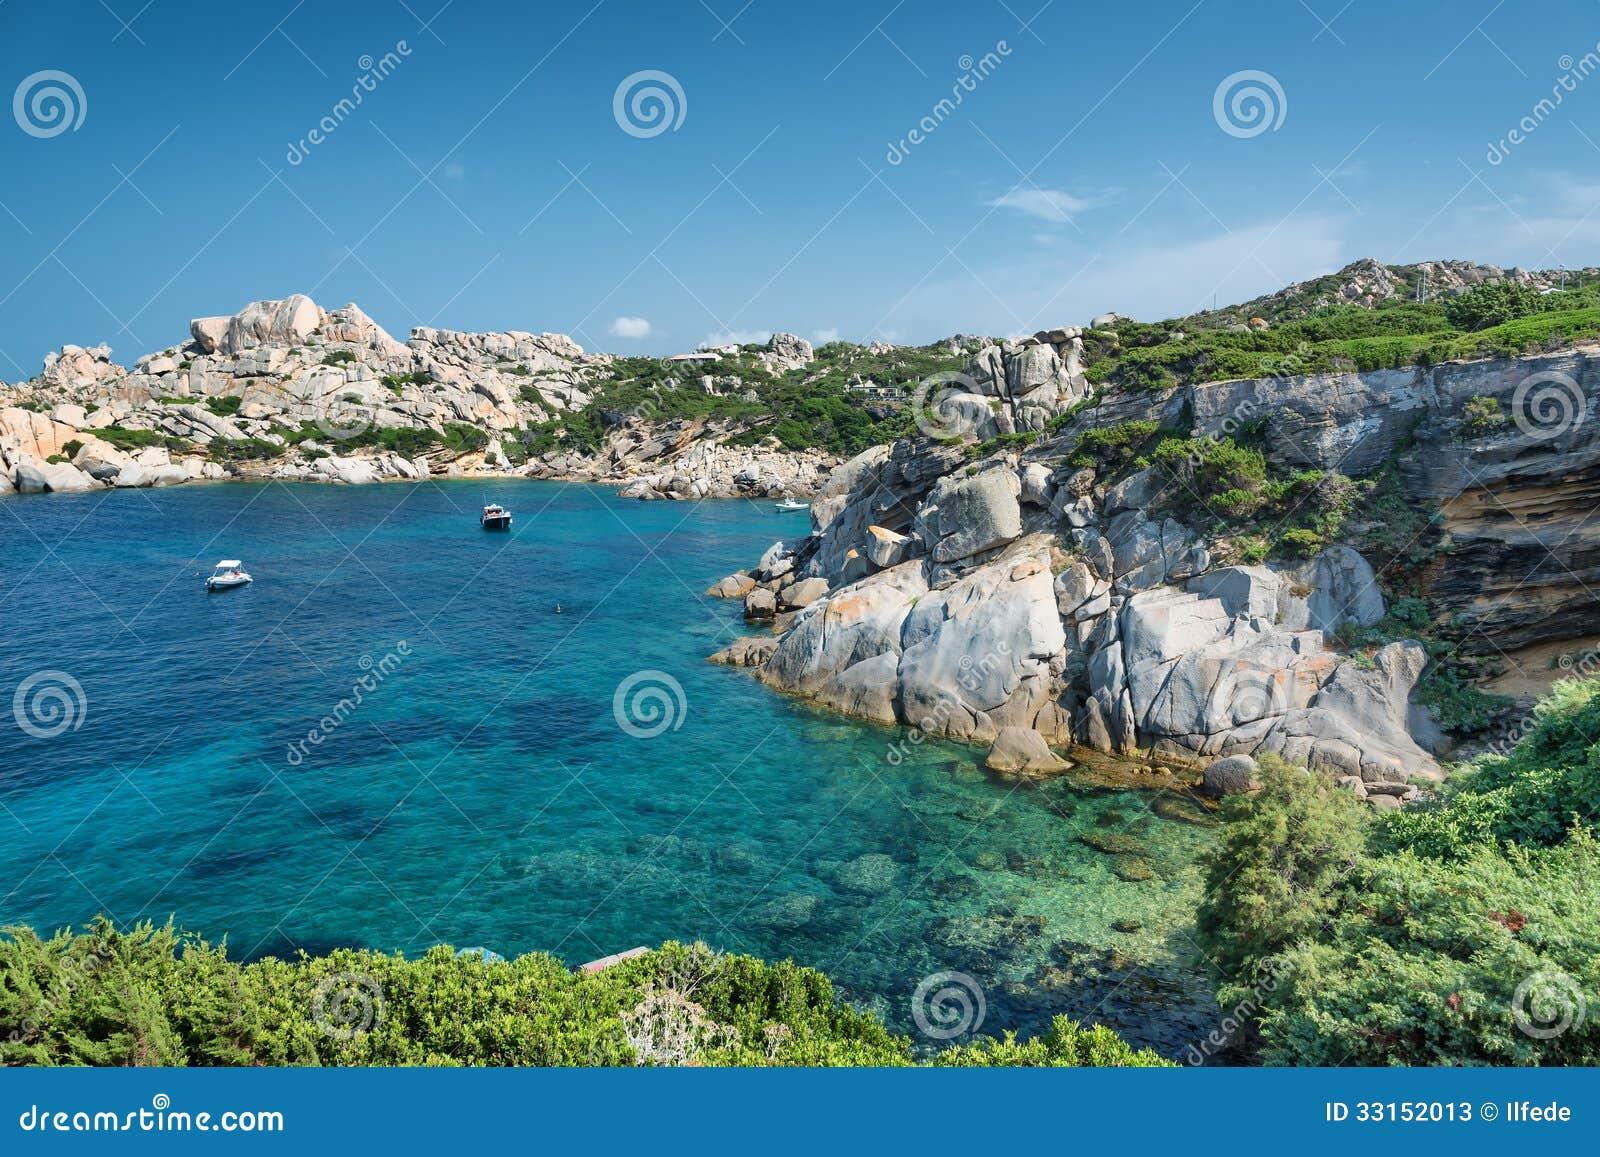 Sardinien Strand Wunderbares Meer In Capo Testa Italien